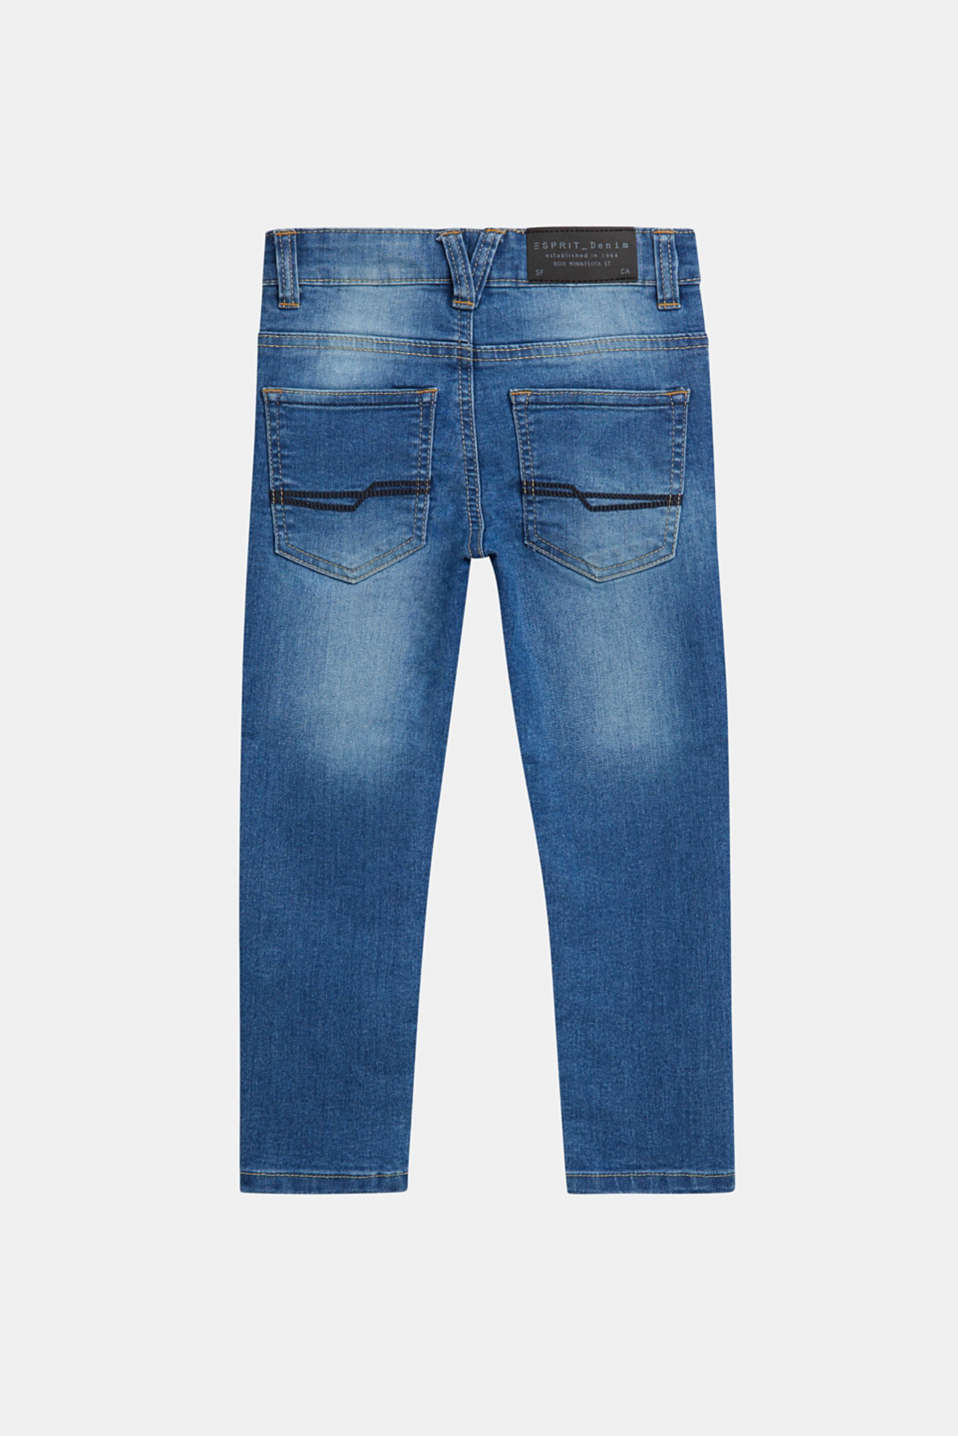 Stretch jeans with an adjustable waist, MEDIUM WASH DE, detail image number 1